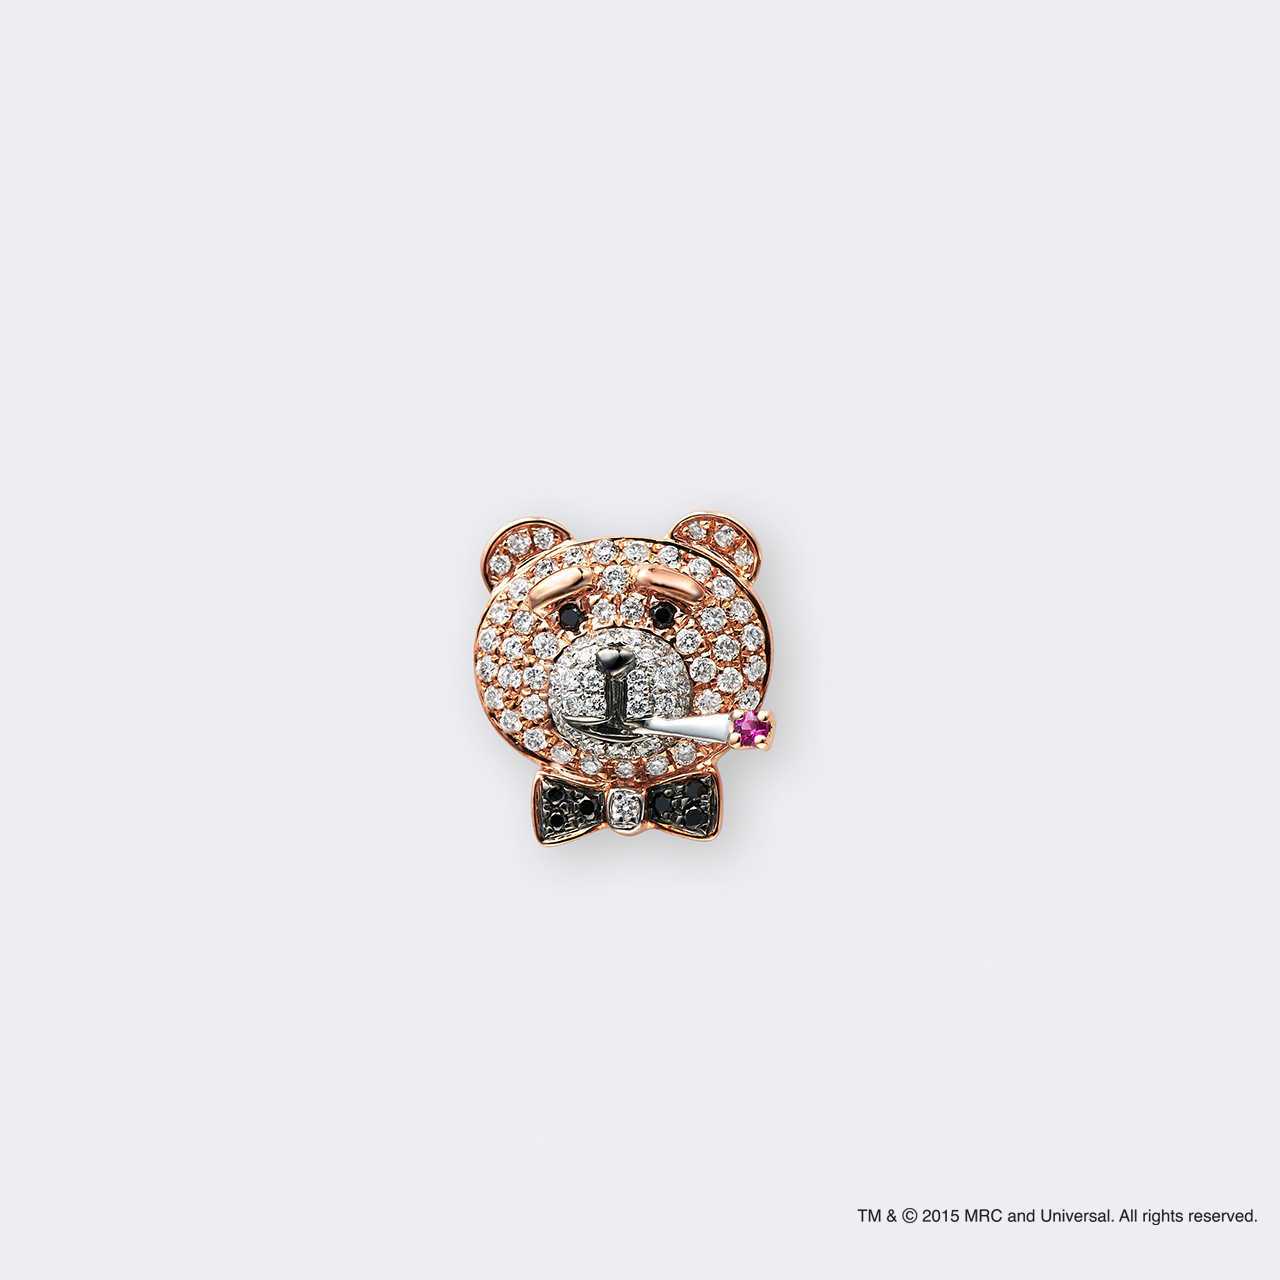 Ted2×BIJOUPIKO (テッド2×ビジュピコ コラボレーションジュエリー)K18PG ピンブローチ シガレット